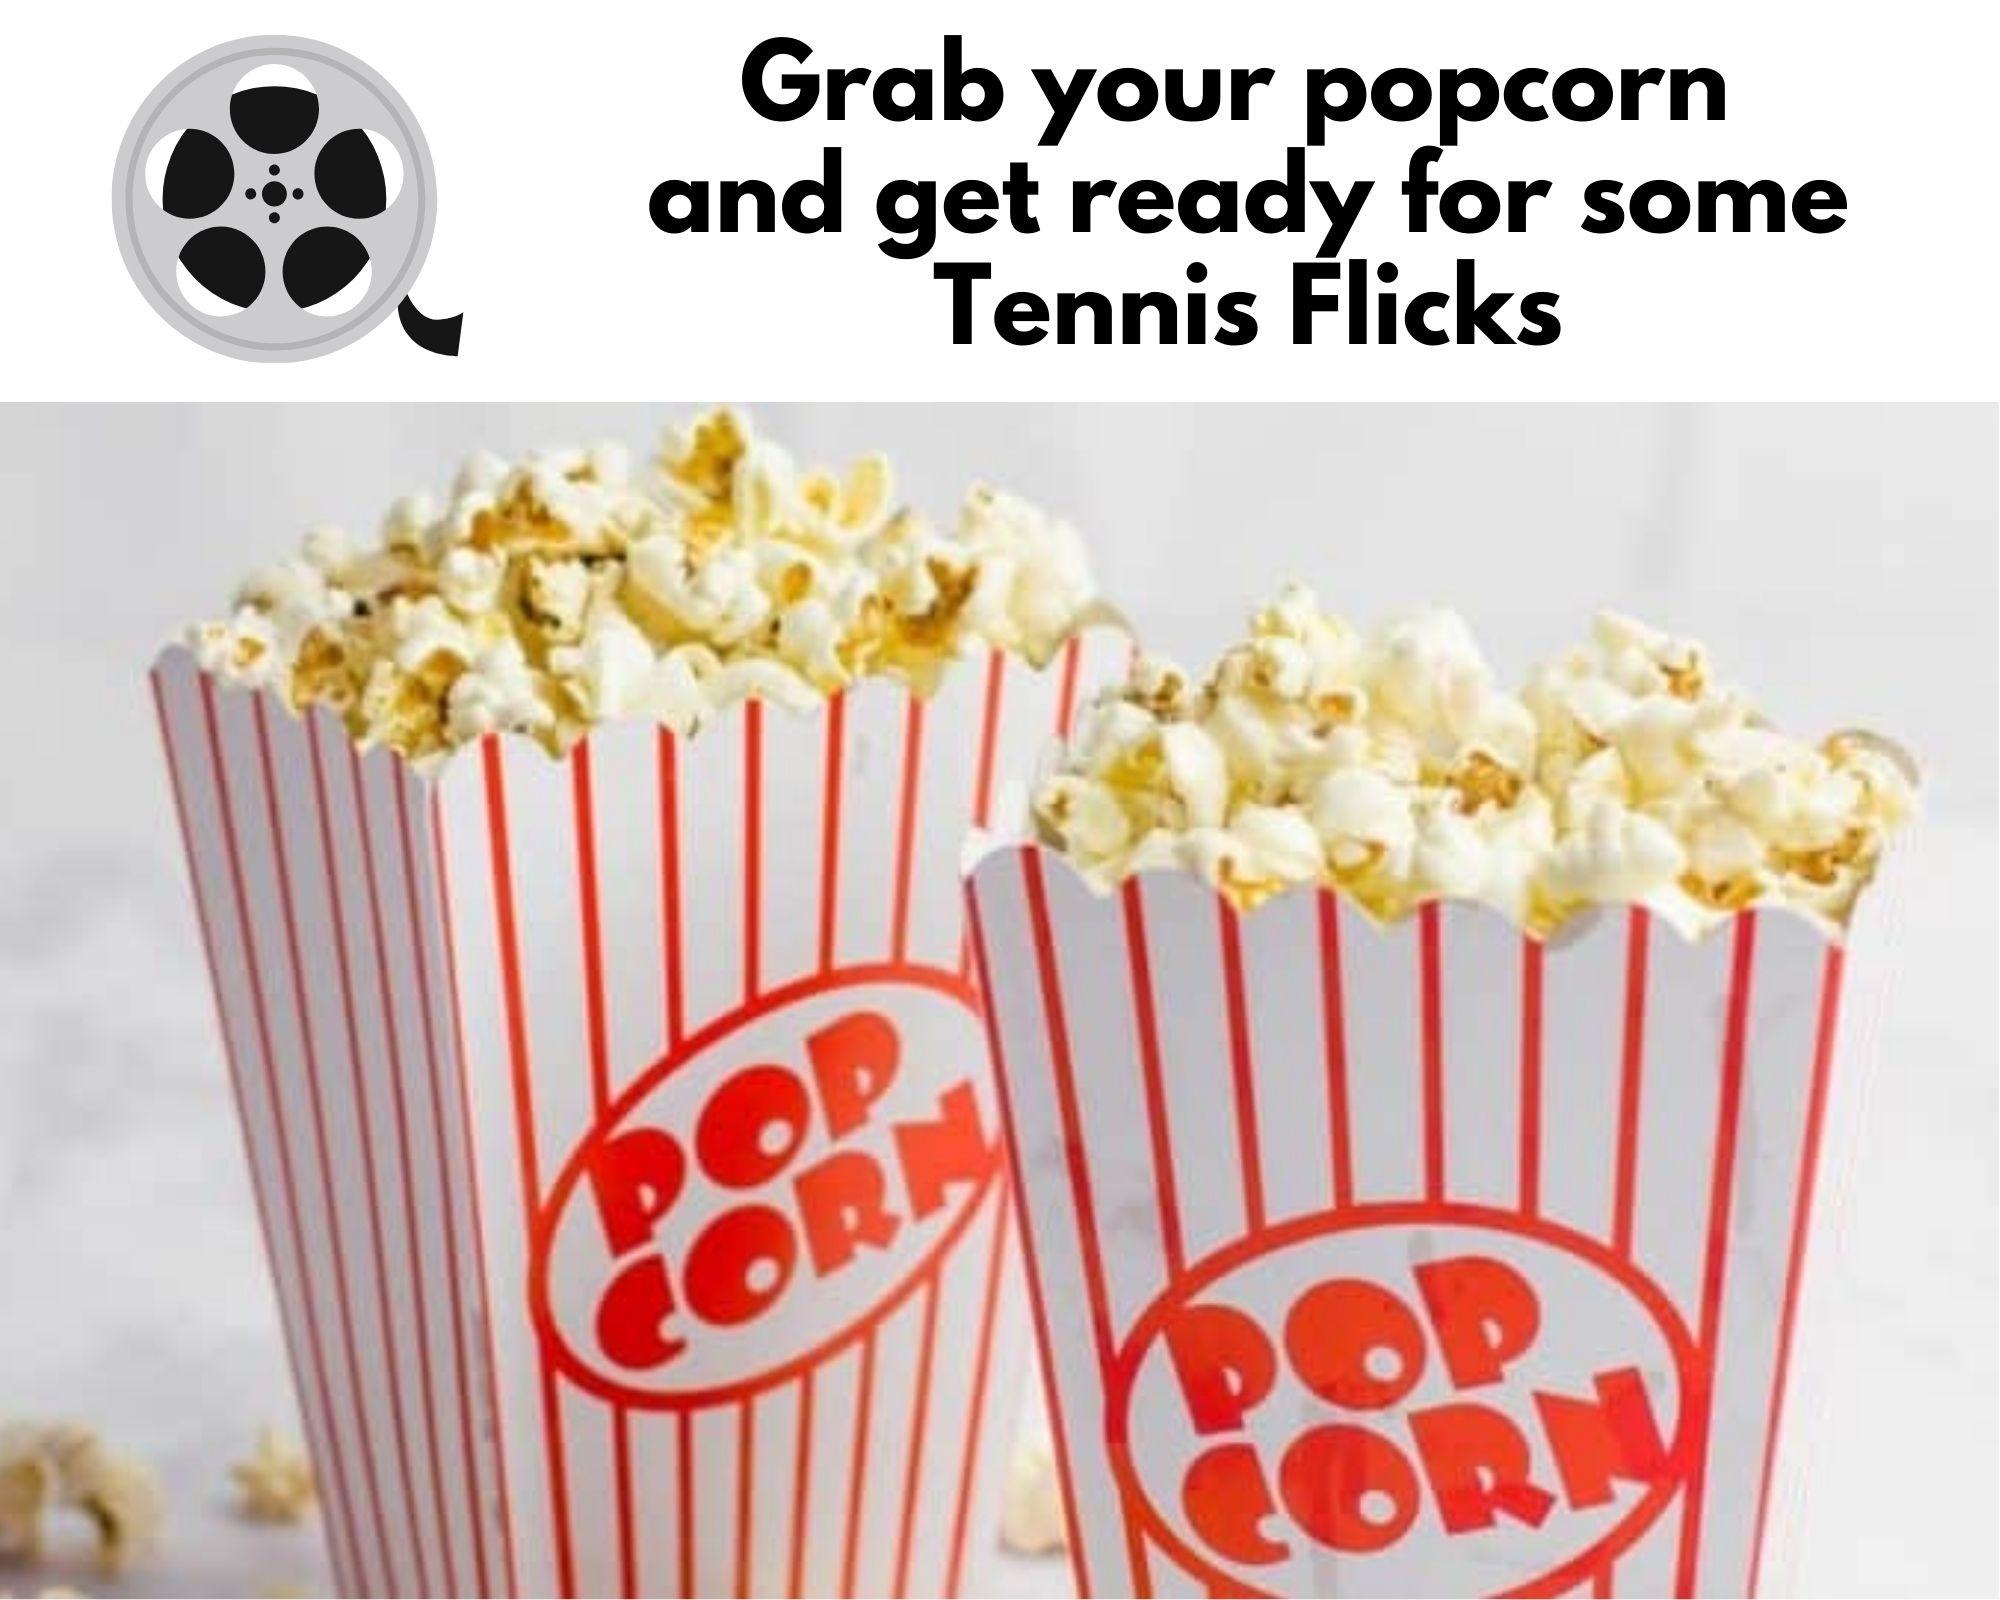 Top 10 Tennis Movies to Watch during Winter Break